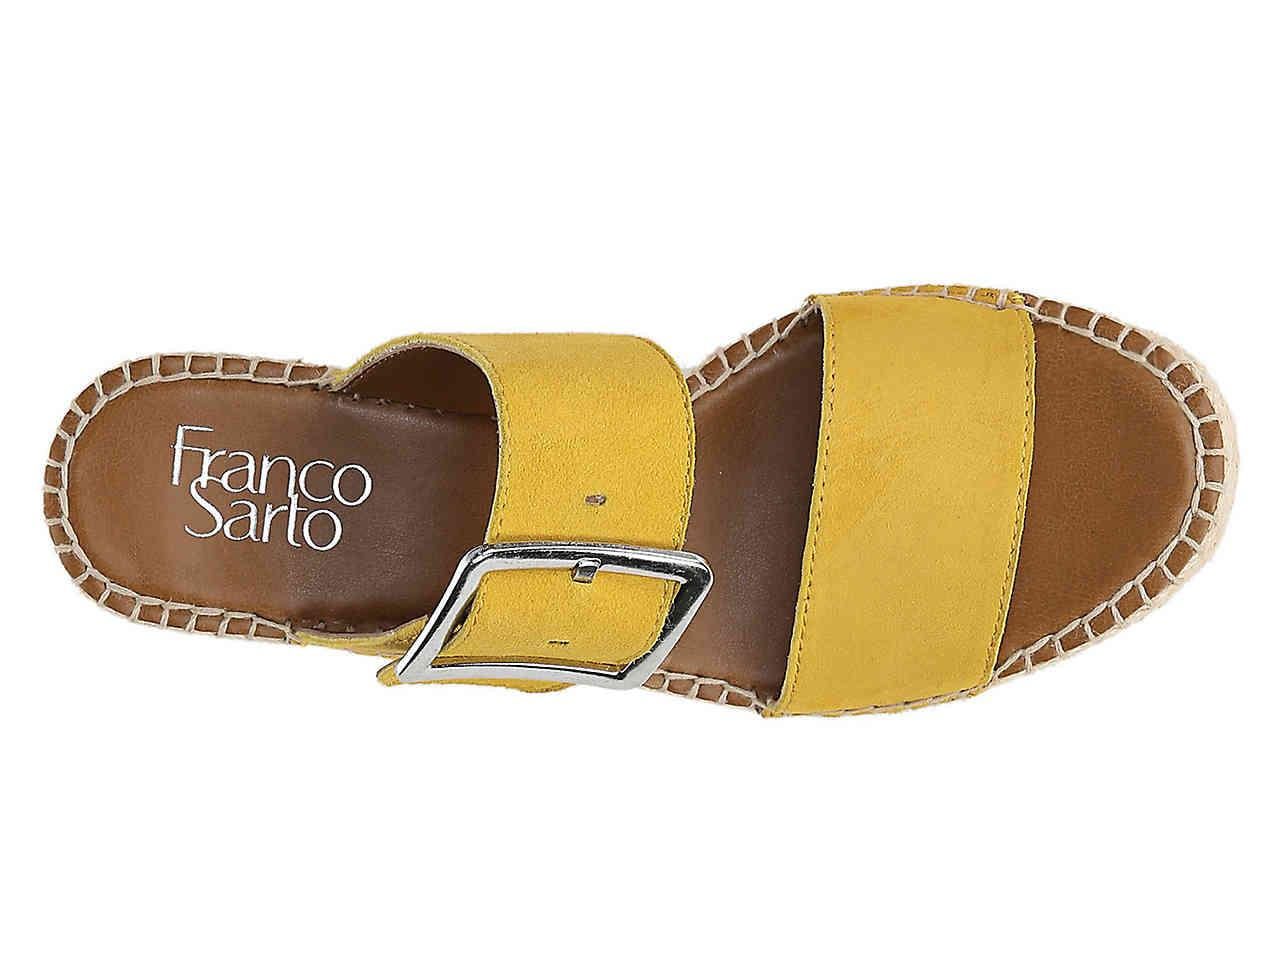 c7fe3d166f3 Franco Sarto Yellow Coastal Espadrille Wedge Sandal